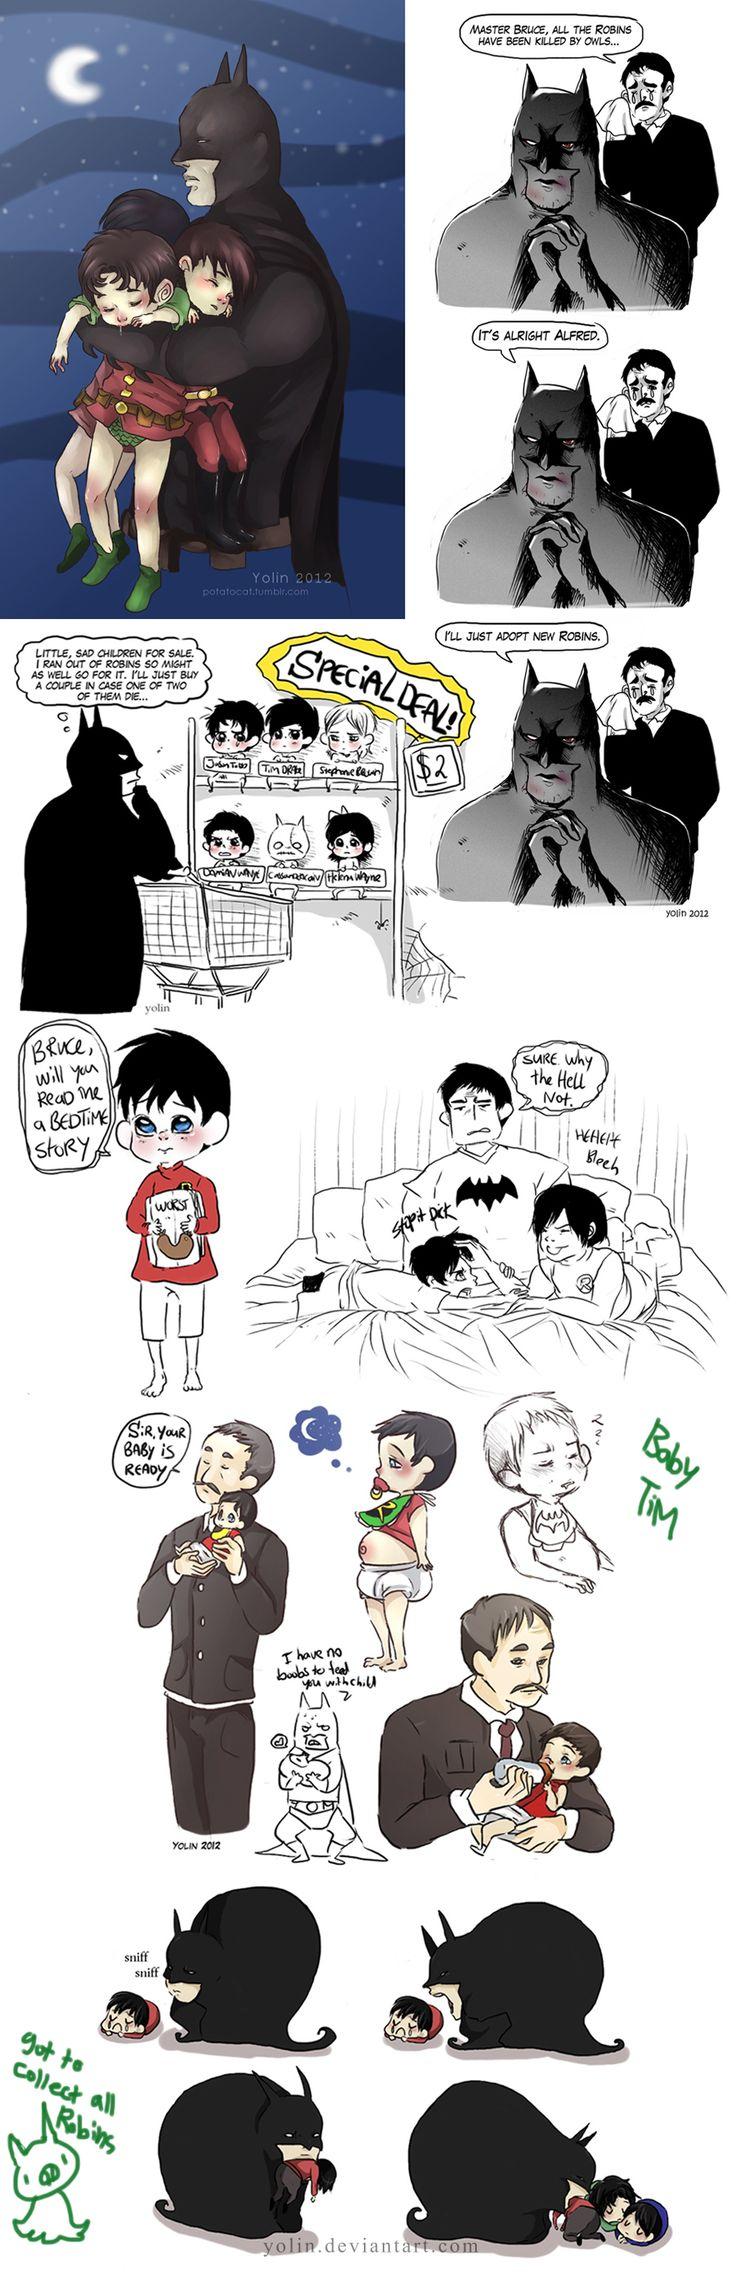 Doodles - Batman 9 by *yolin on deviantART